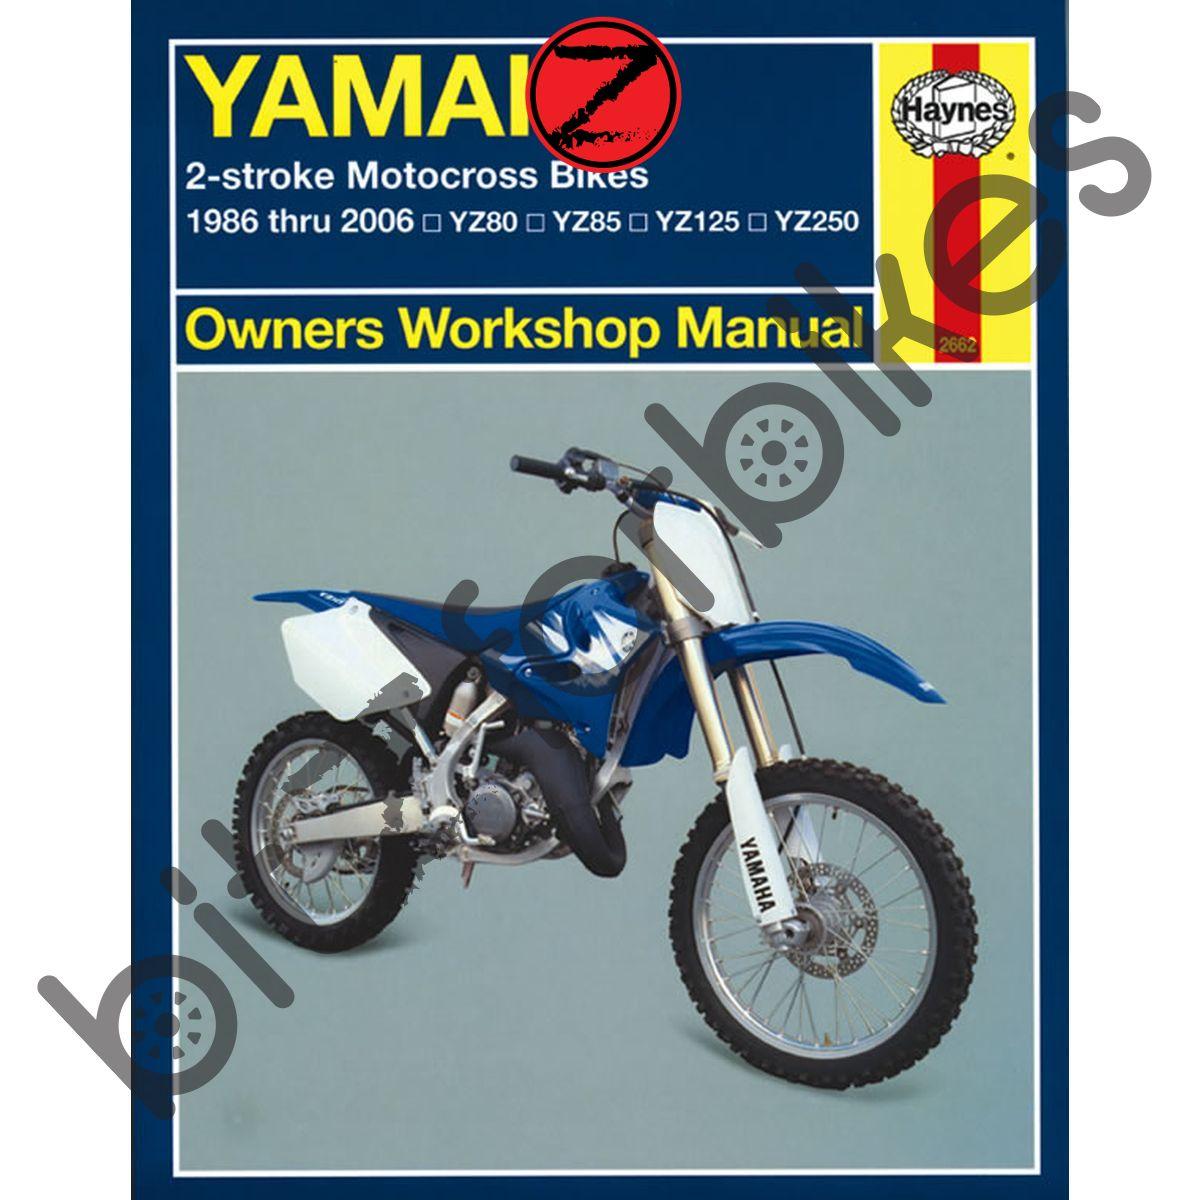 Sentinel Haynes Motorcycle Manual Yamaha YZ80 86-01 YZ85 02-06 YZ125 YZ250  86-